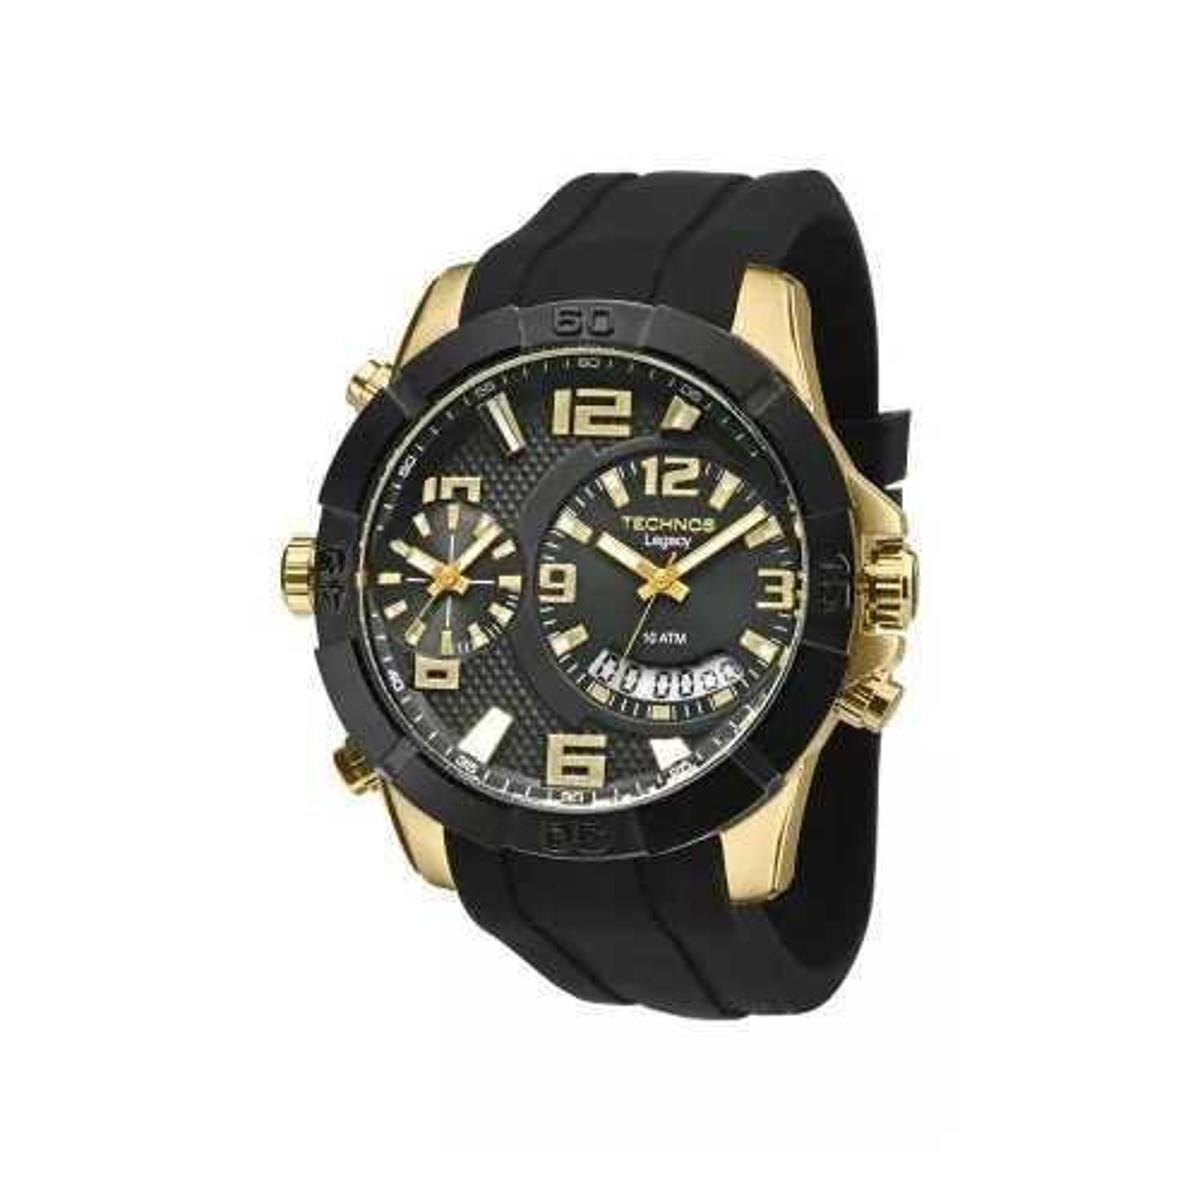 c2ba85526ef Relógio Technos Legacy Dual Time T205FJ 8P 52mm Silicone - Preto - Compre  Agora